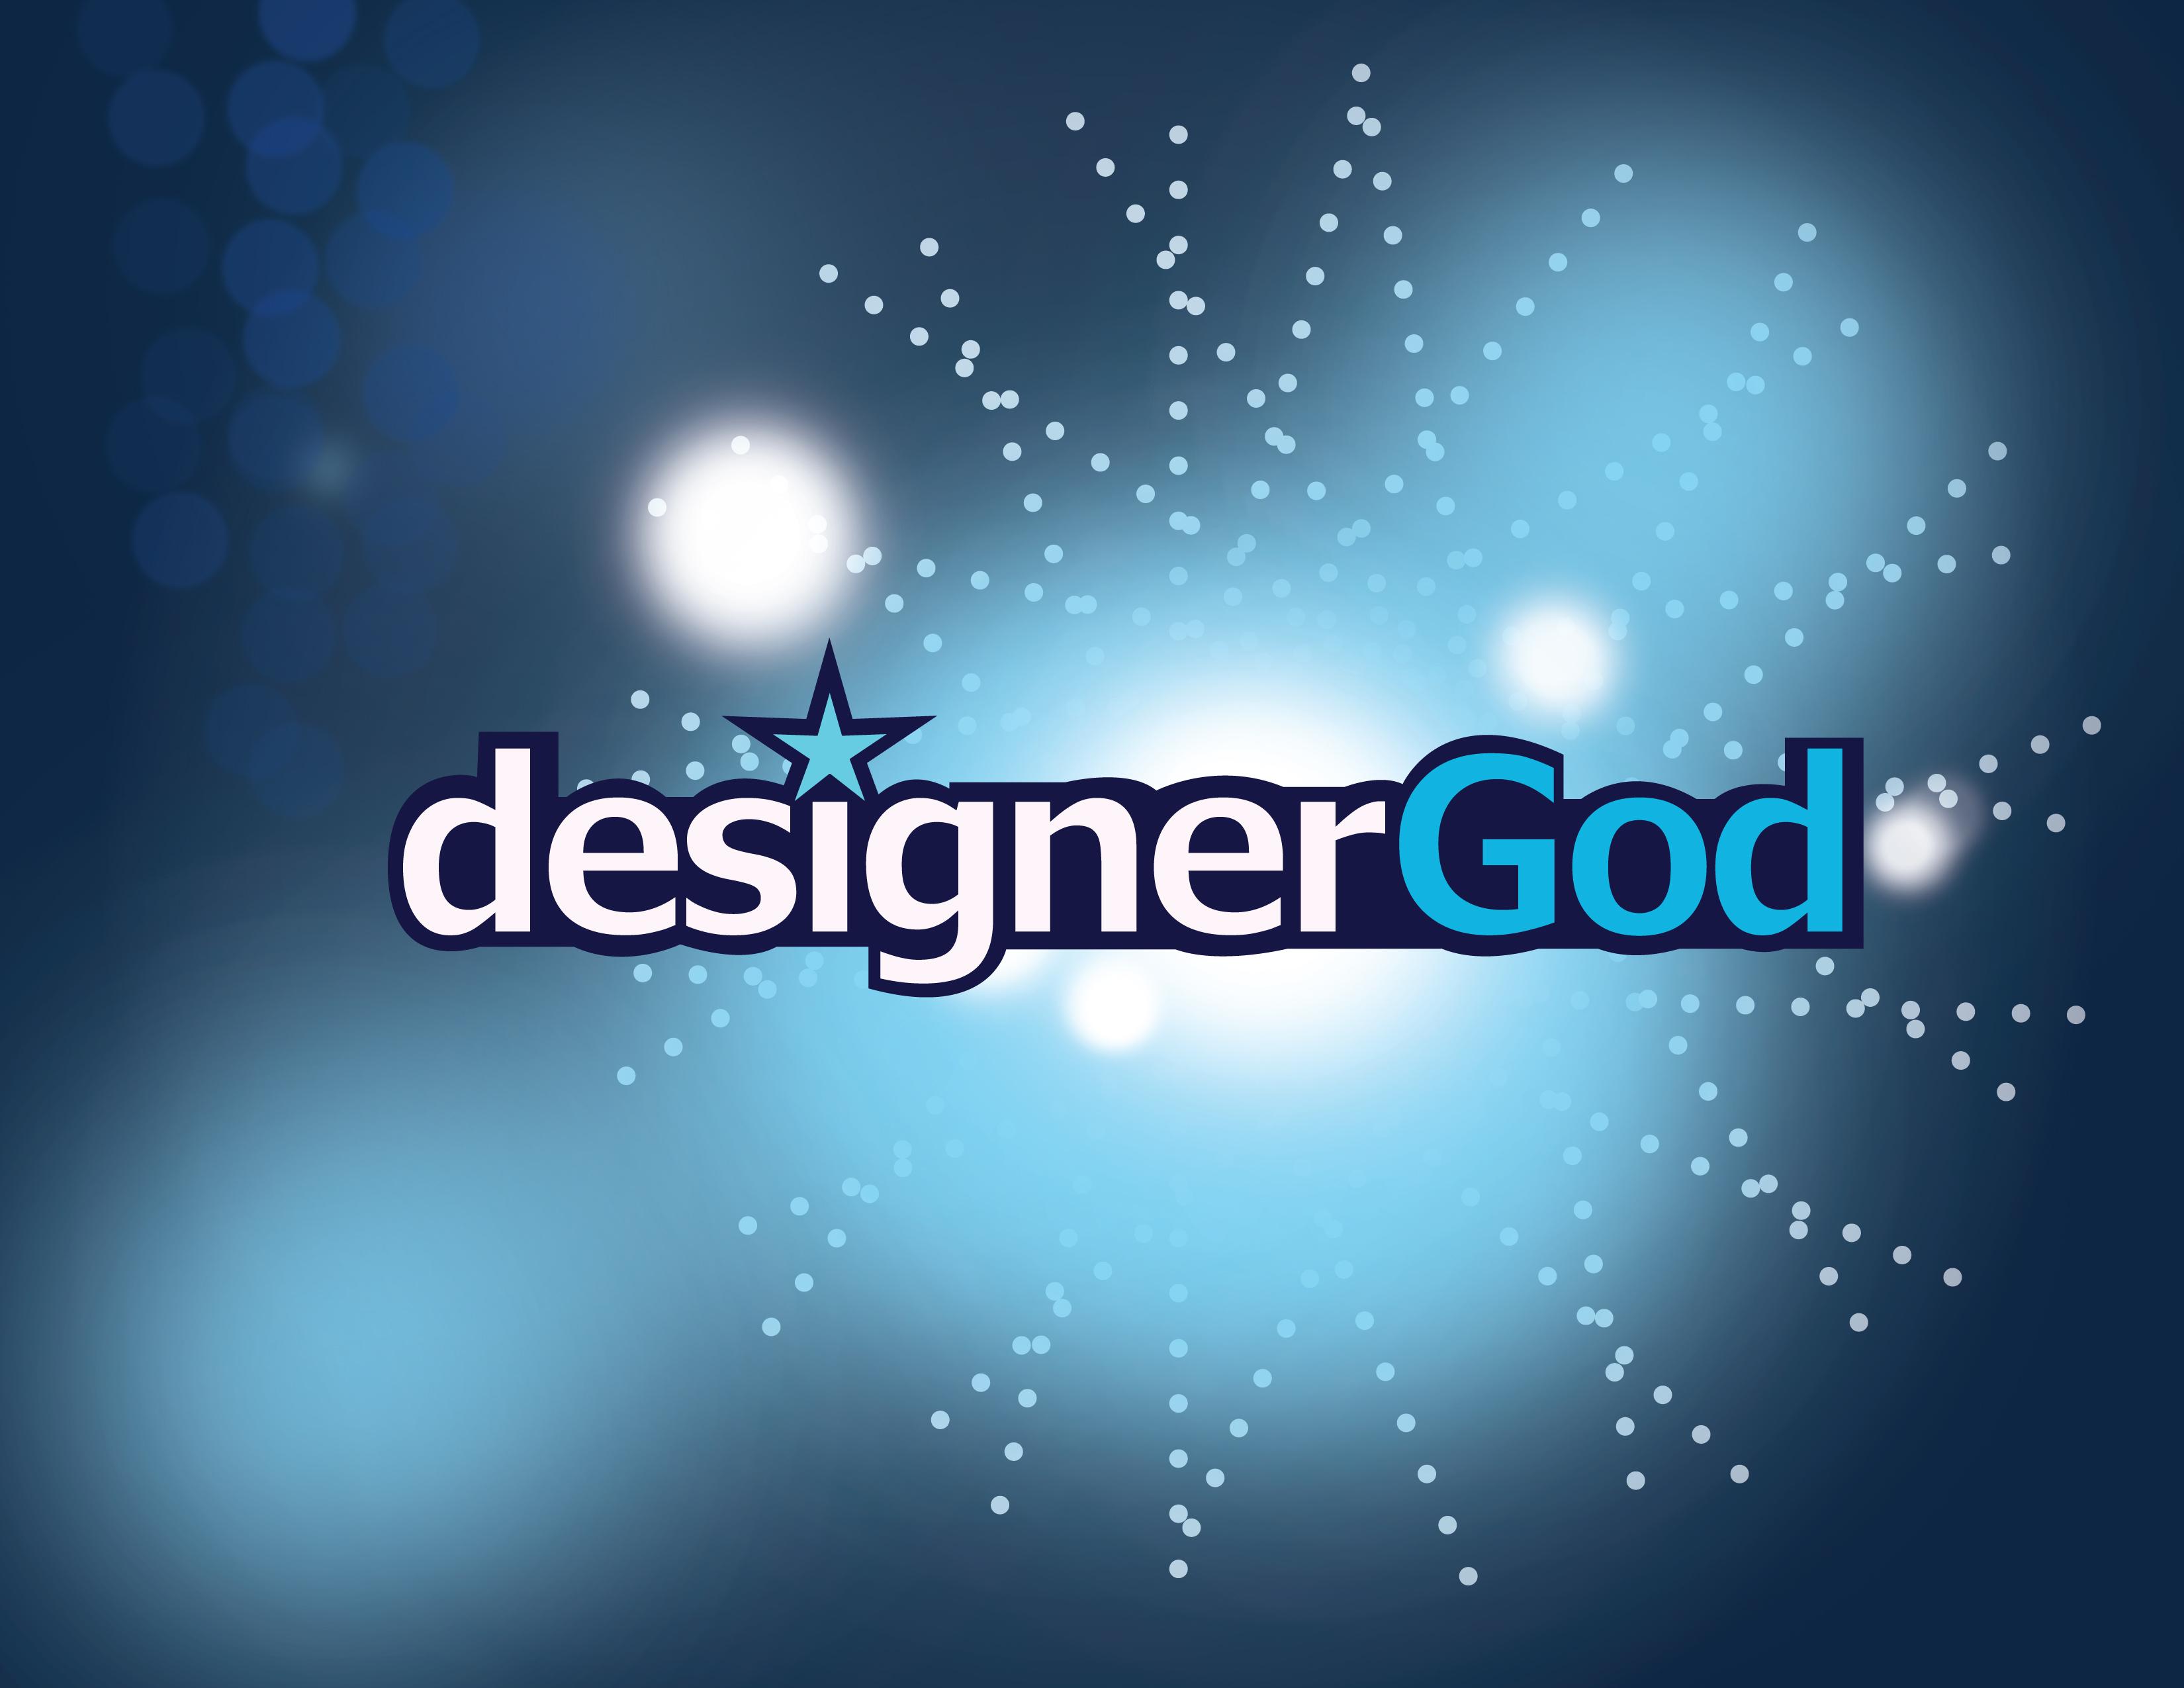 Designer god